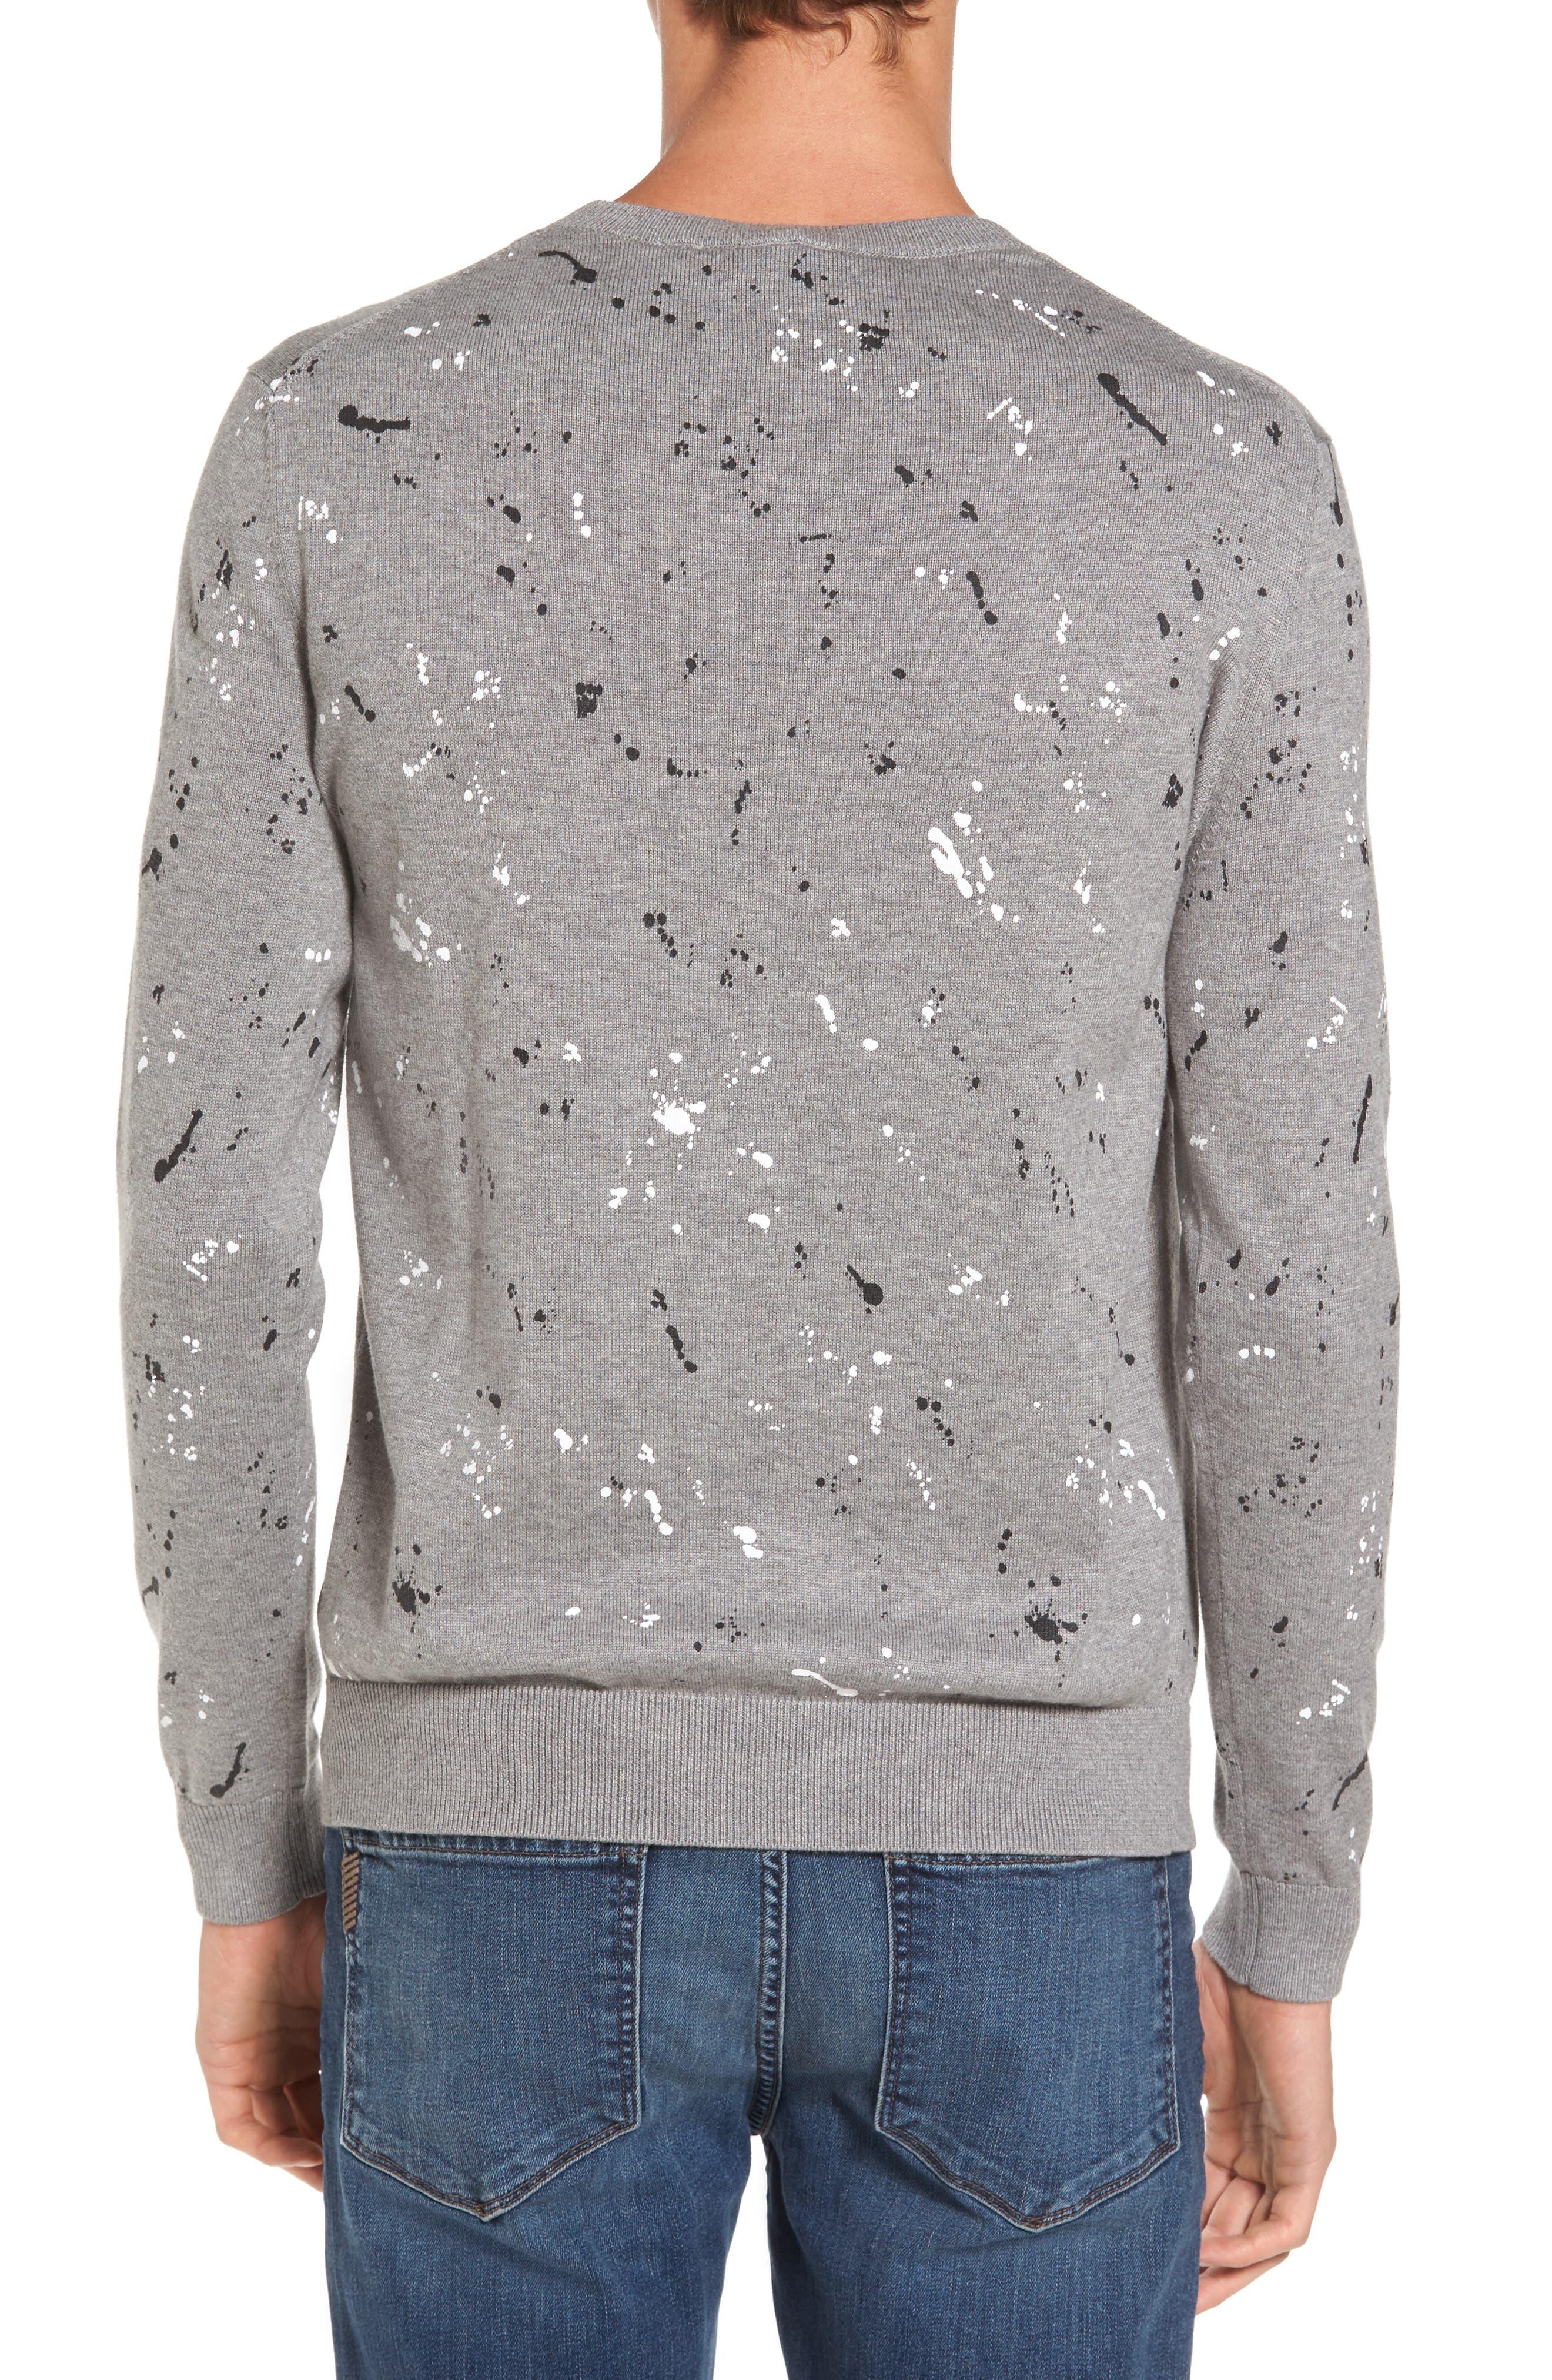 Alternate Image 2  - Lacoste Splatter Sweater